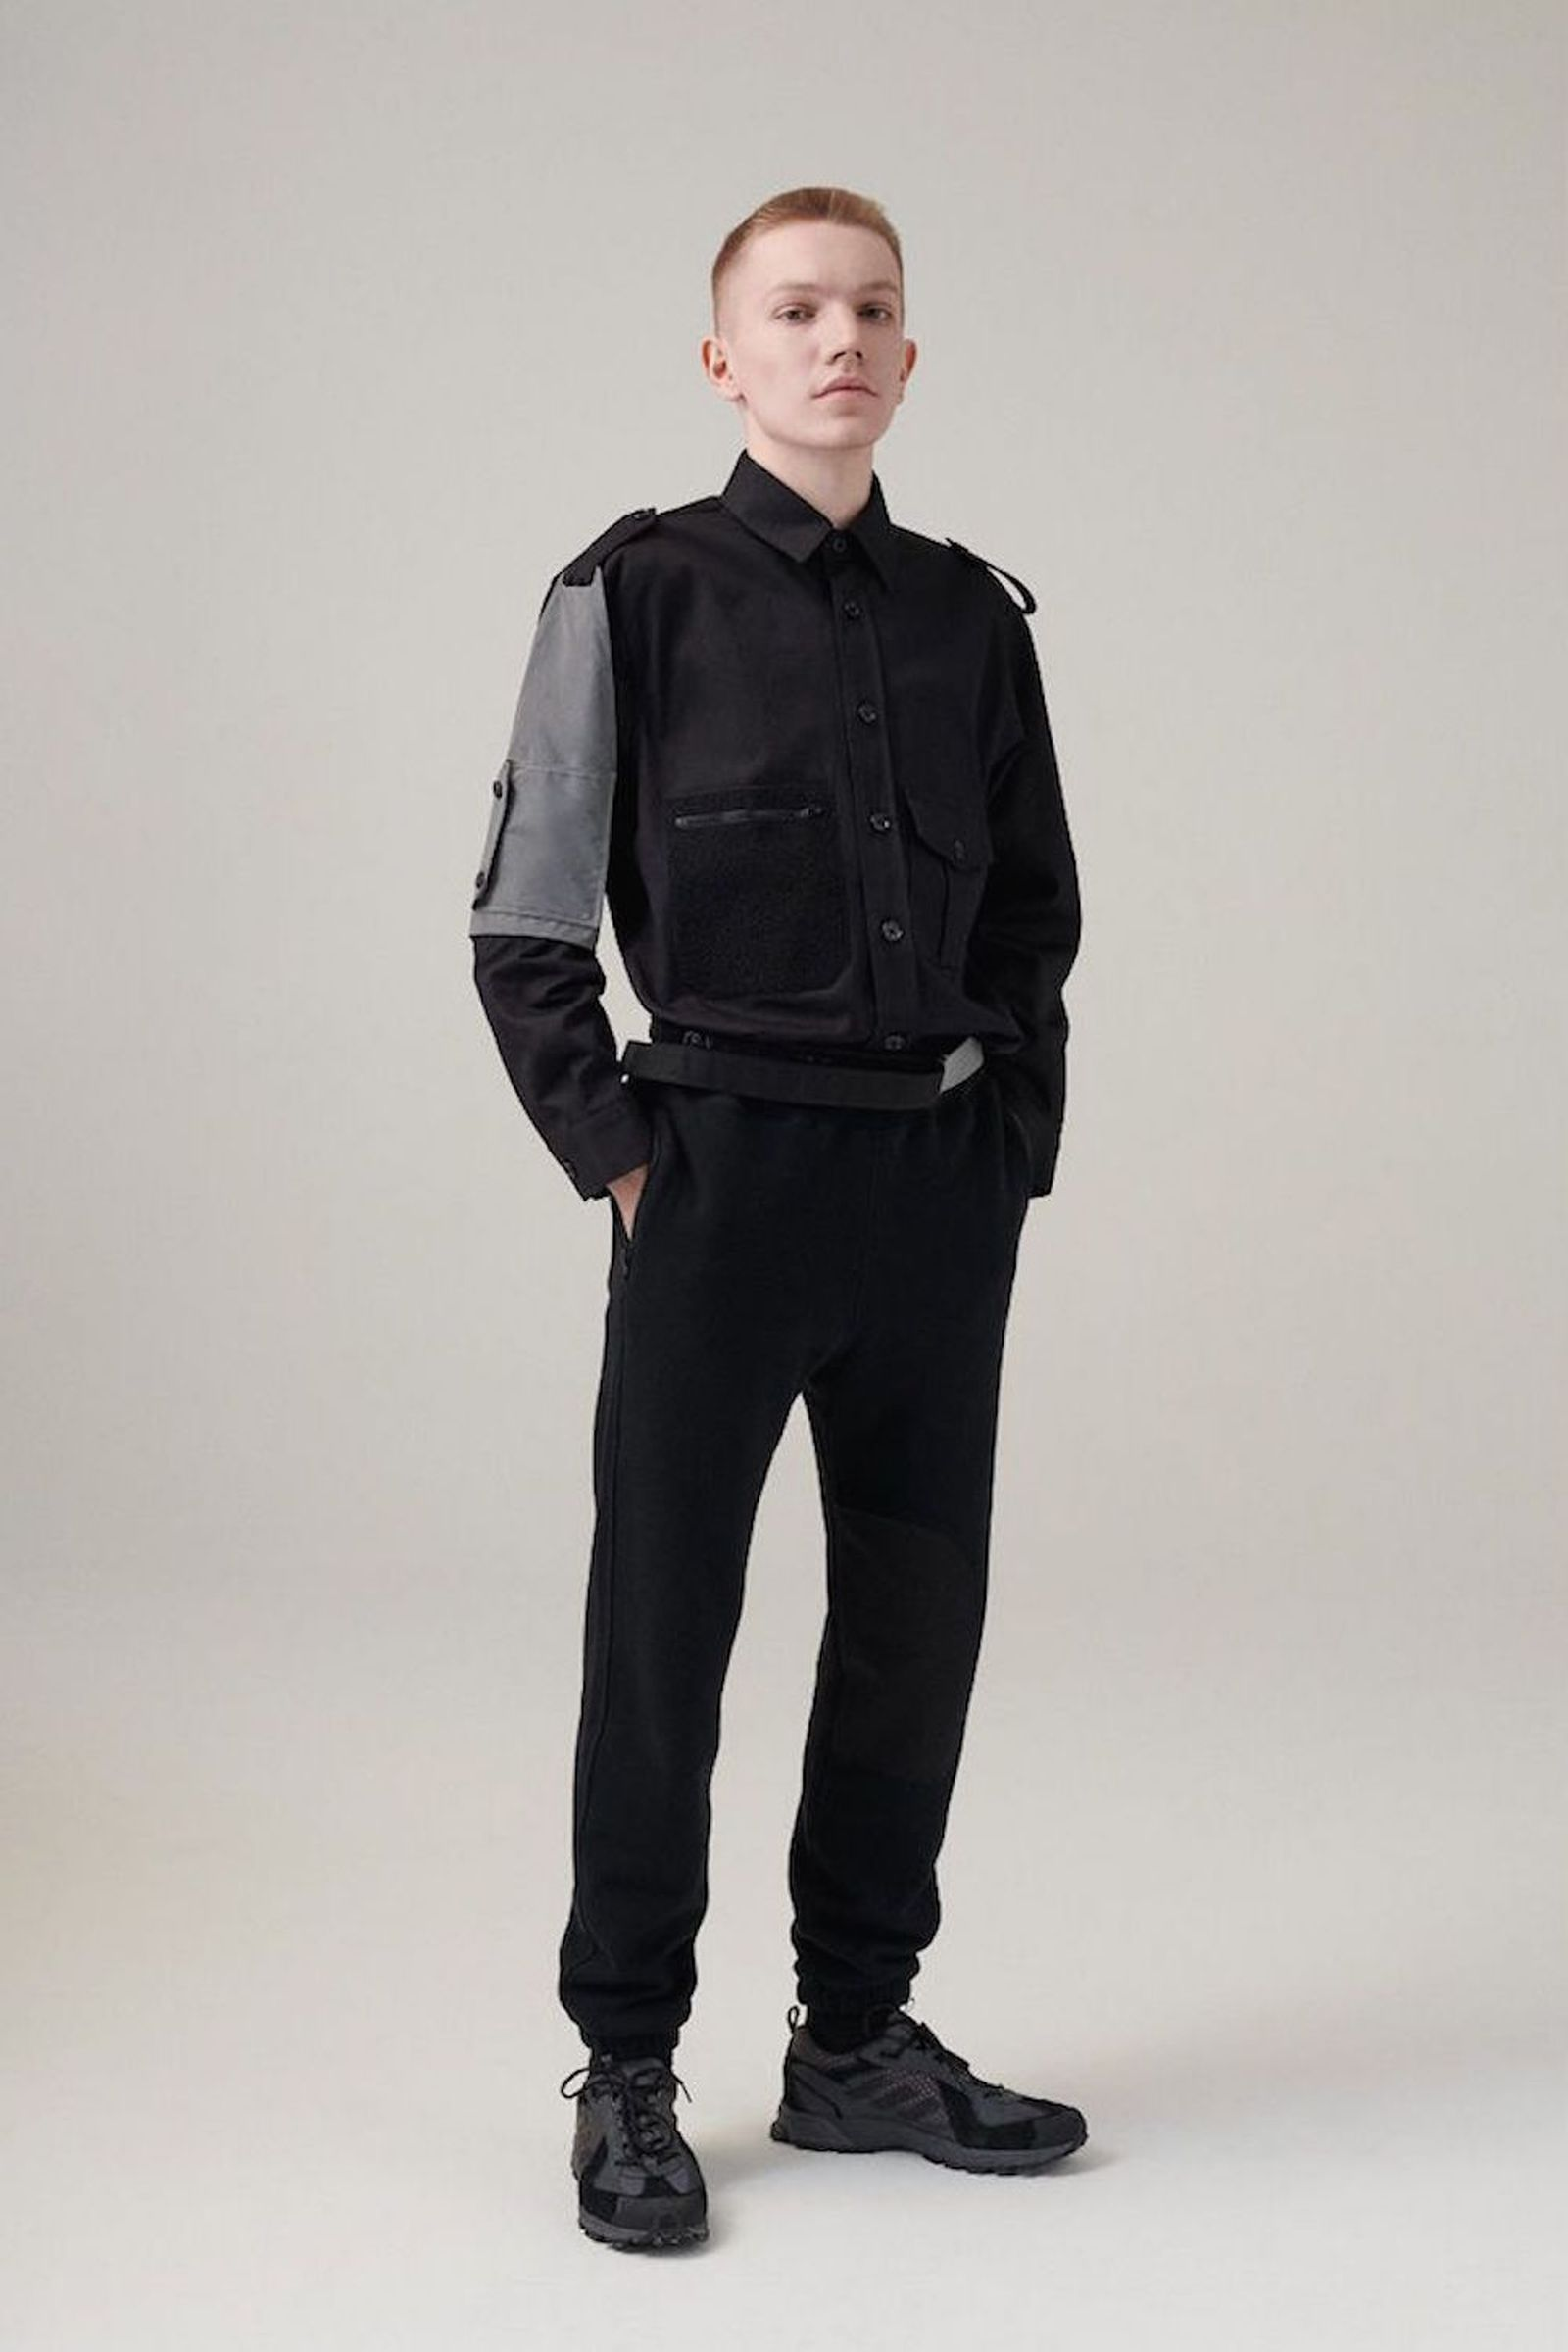 gr uniforma ss19 gruppa lookbook GR-Uniforma Gosha Rubchinskiy